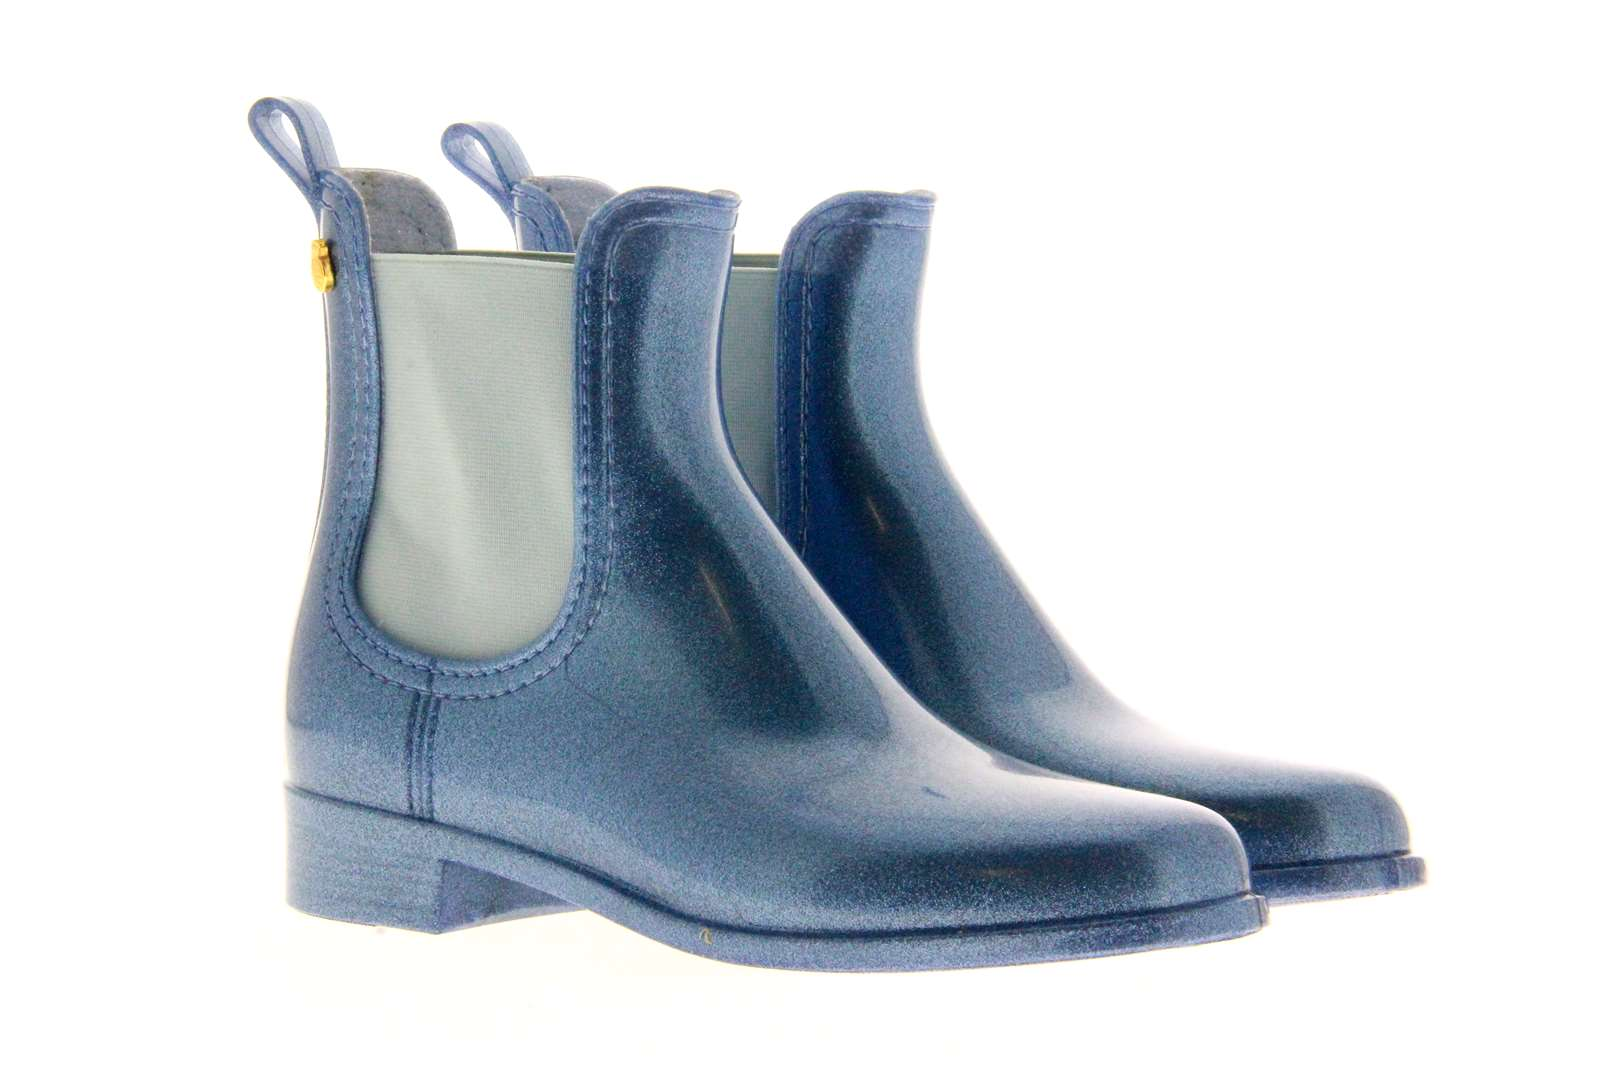 Lemon Jelly Chelsea Boot COMFY 16 SKY BLUE (38)